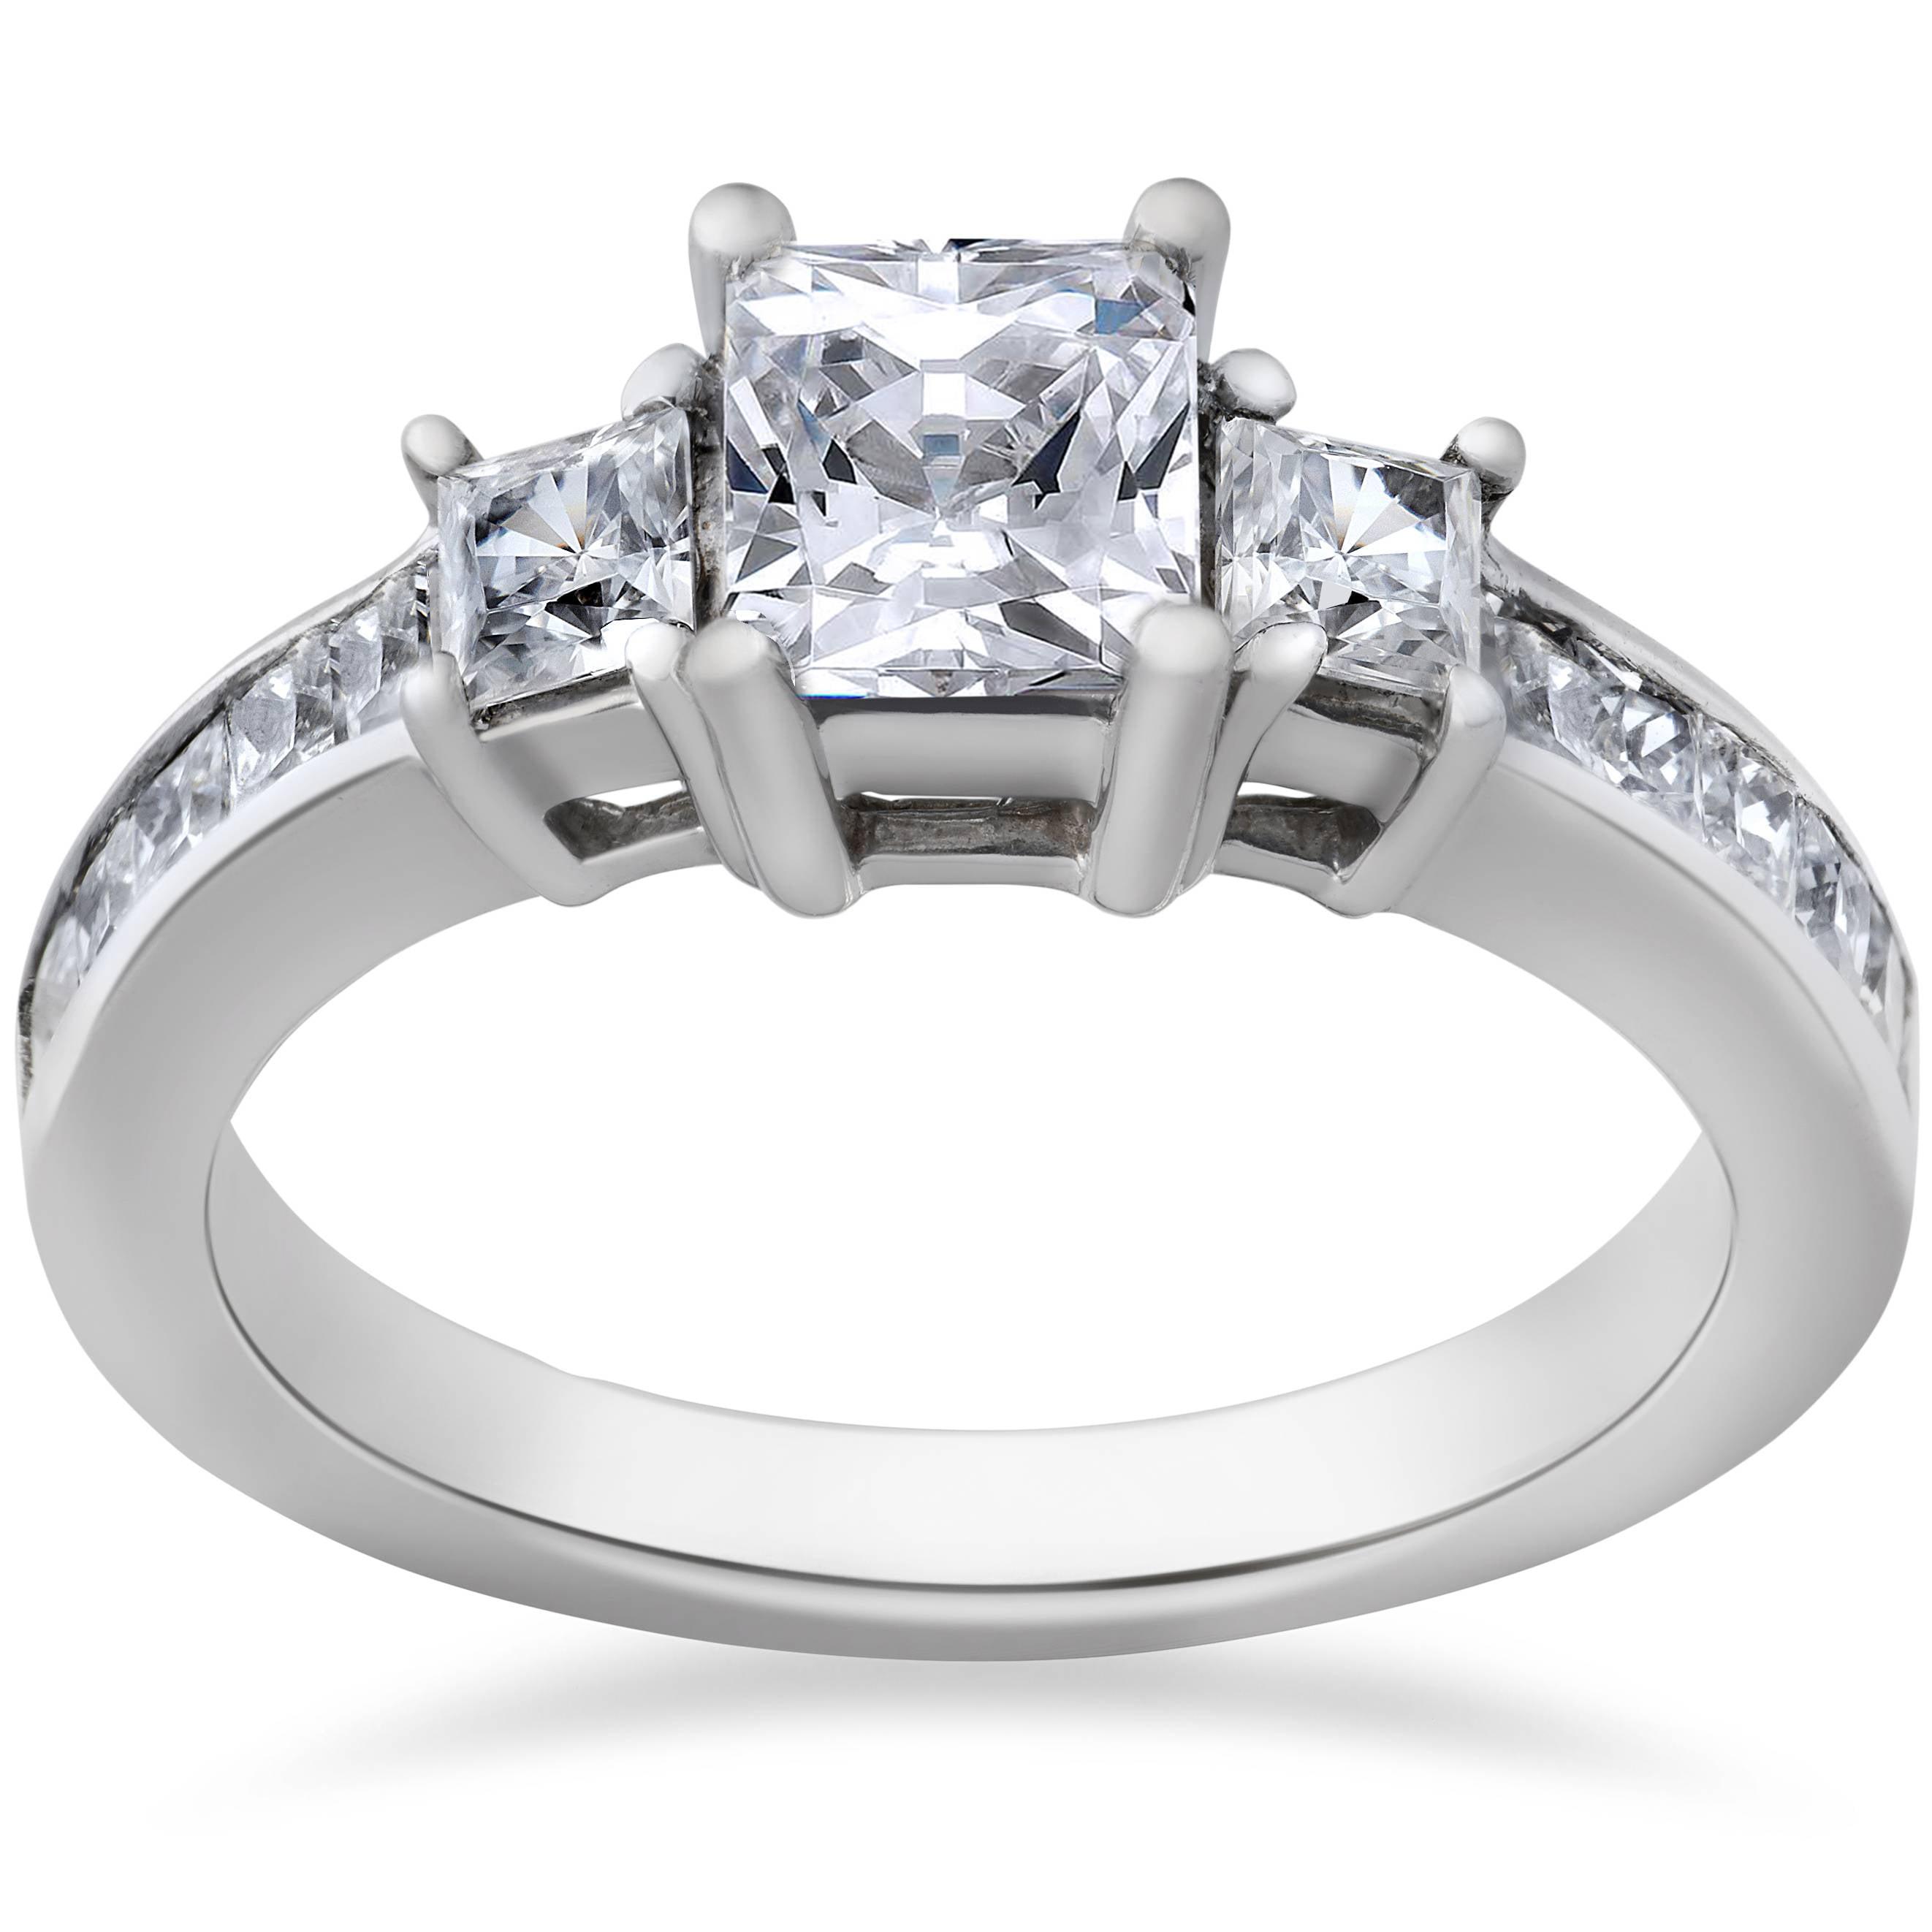 2 Ct Princess Cut Diamond 3 Stone Engagement Ring 14k White Gold Walmart Canada